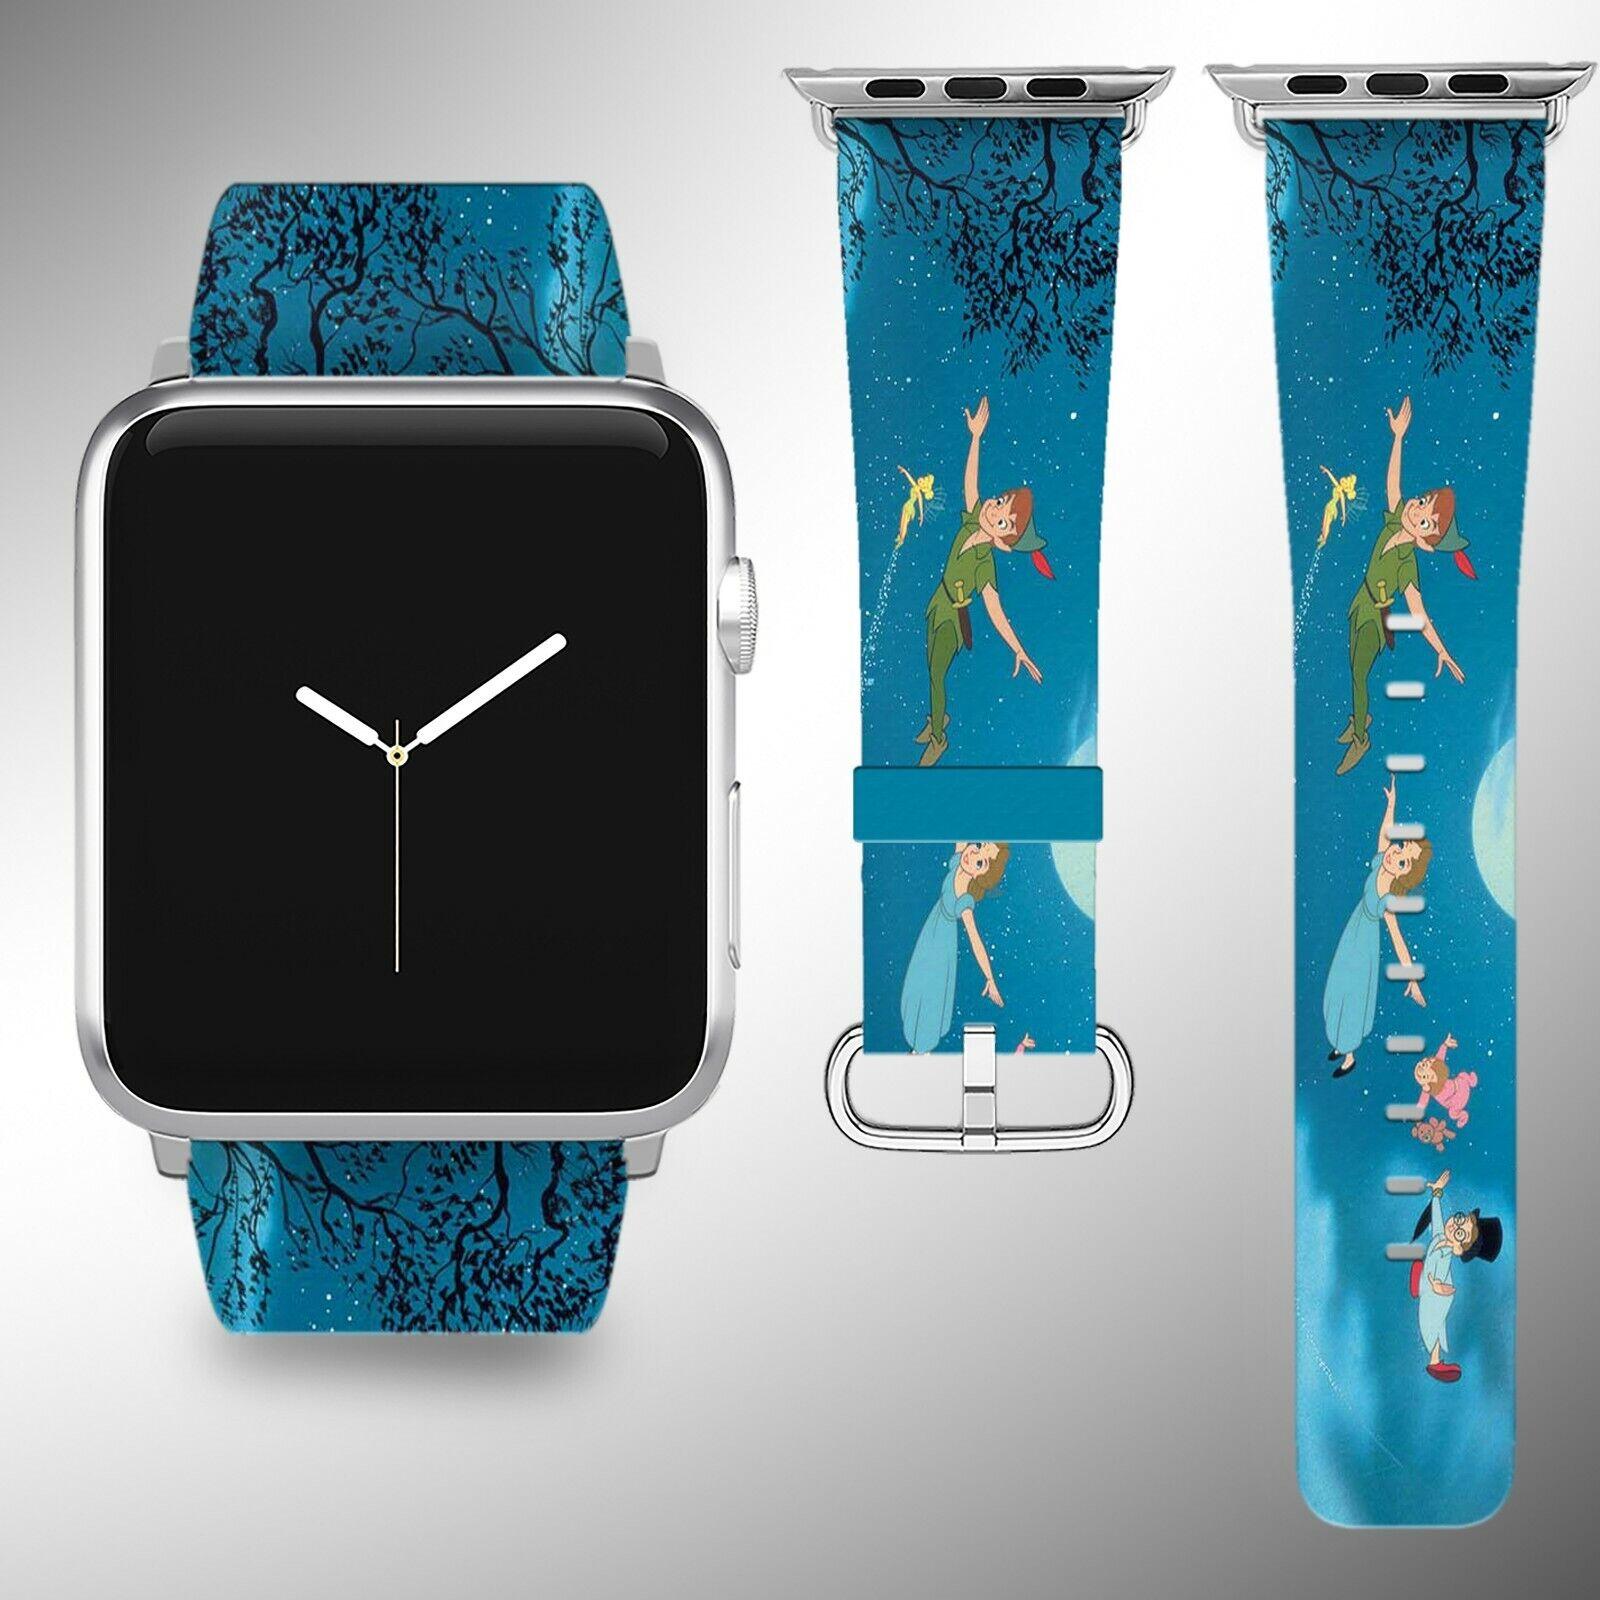 iwatch: Peter Pan Apple Watch Band 38 40 42 44 Series SE 6 5 1 2 3 4 Wrist Strap iWatch